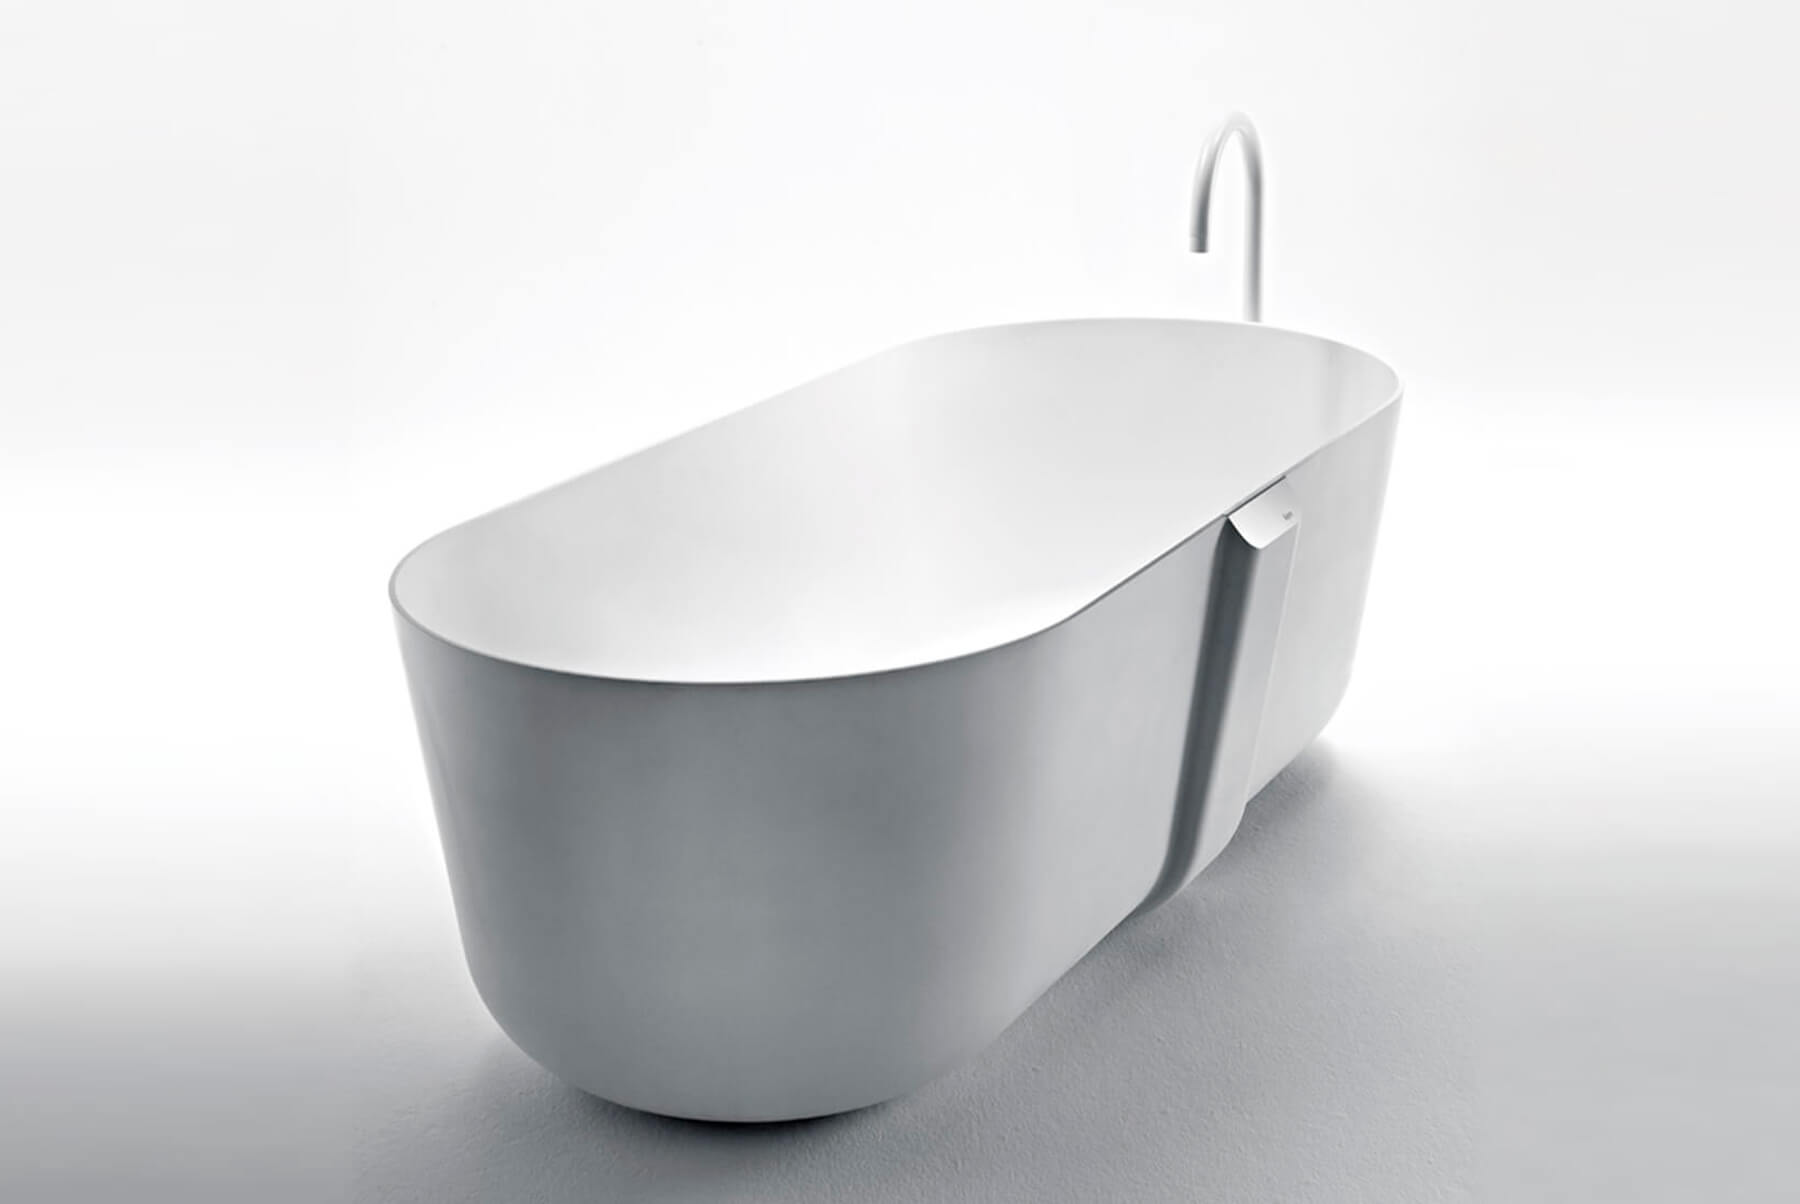 Bath-Tubs-Falper-Quattro-zero-angle-1800x1204